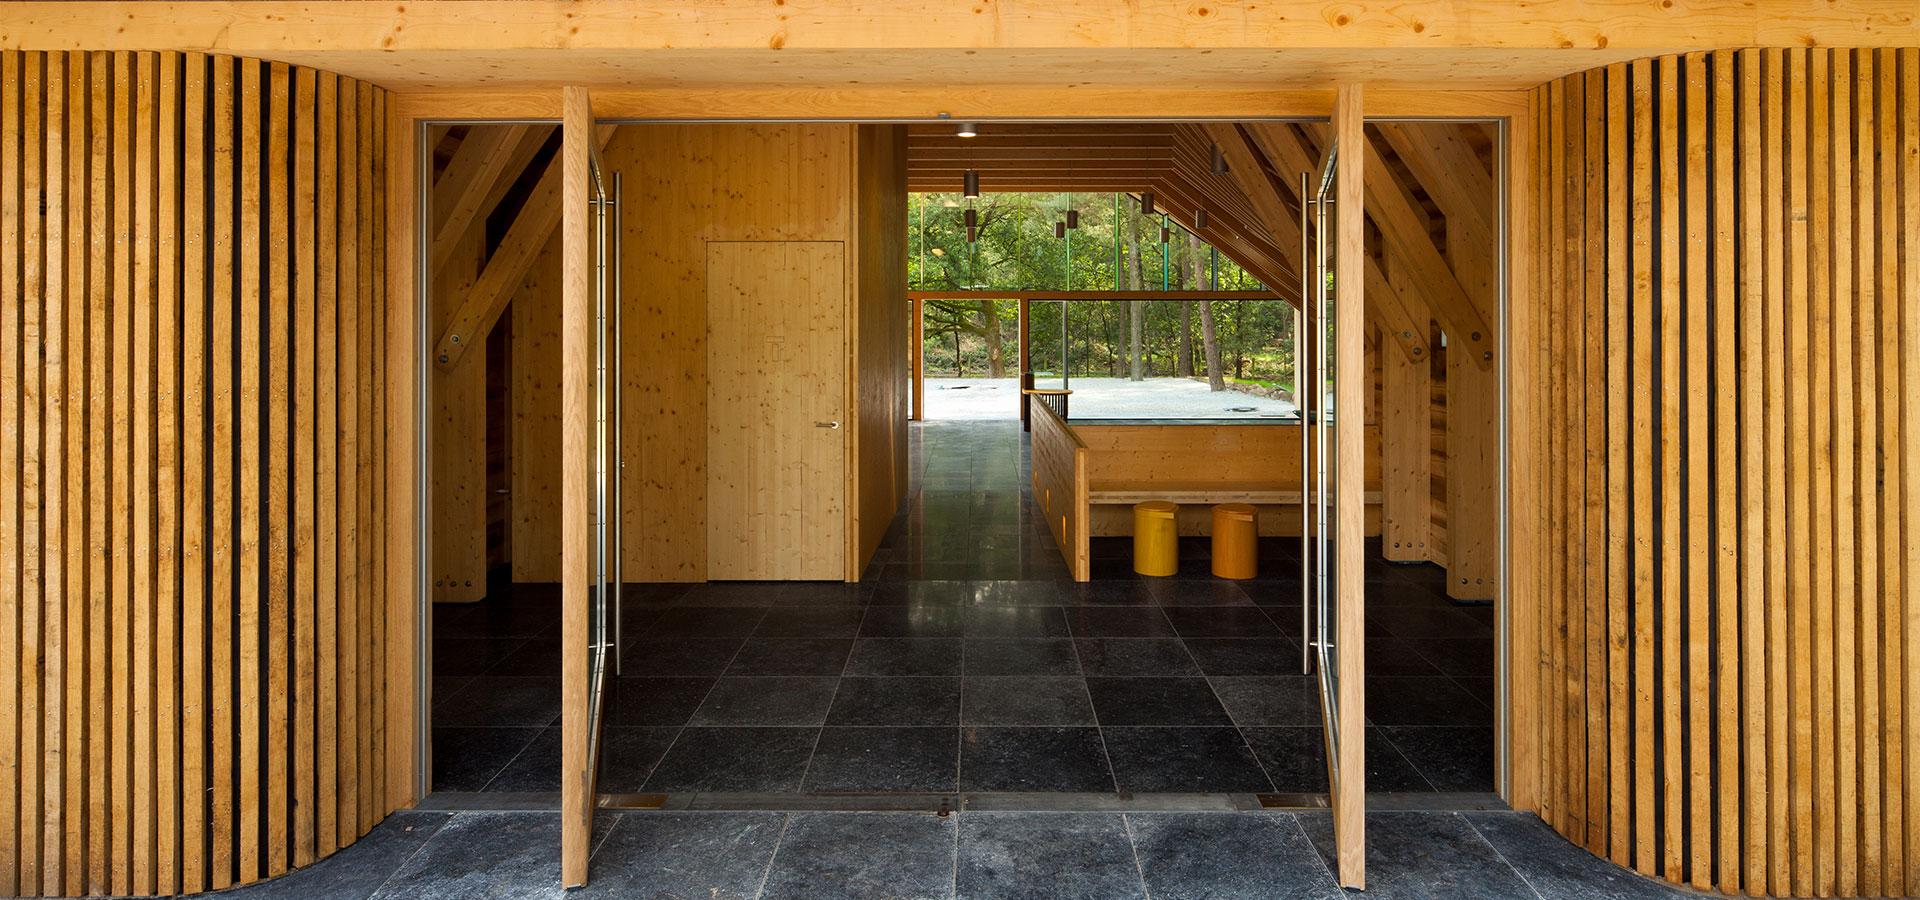 FARO architecten Kerkje Elspeet 05